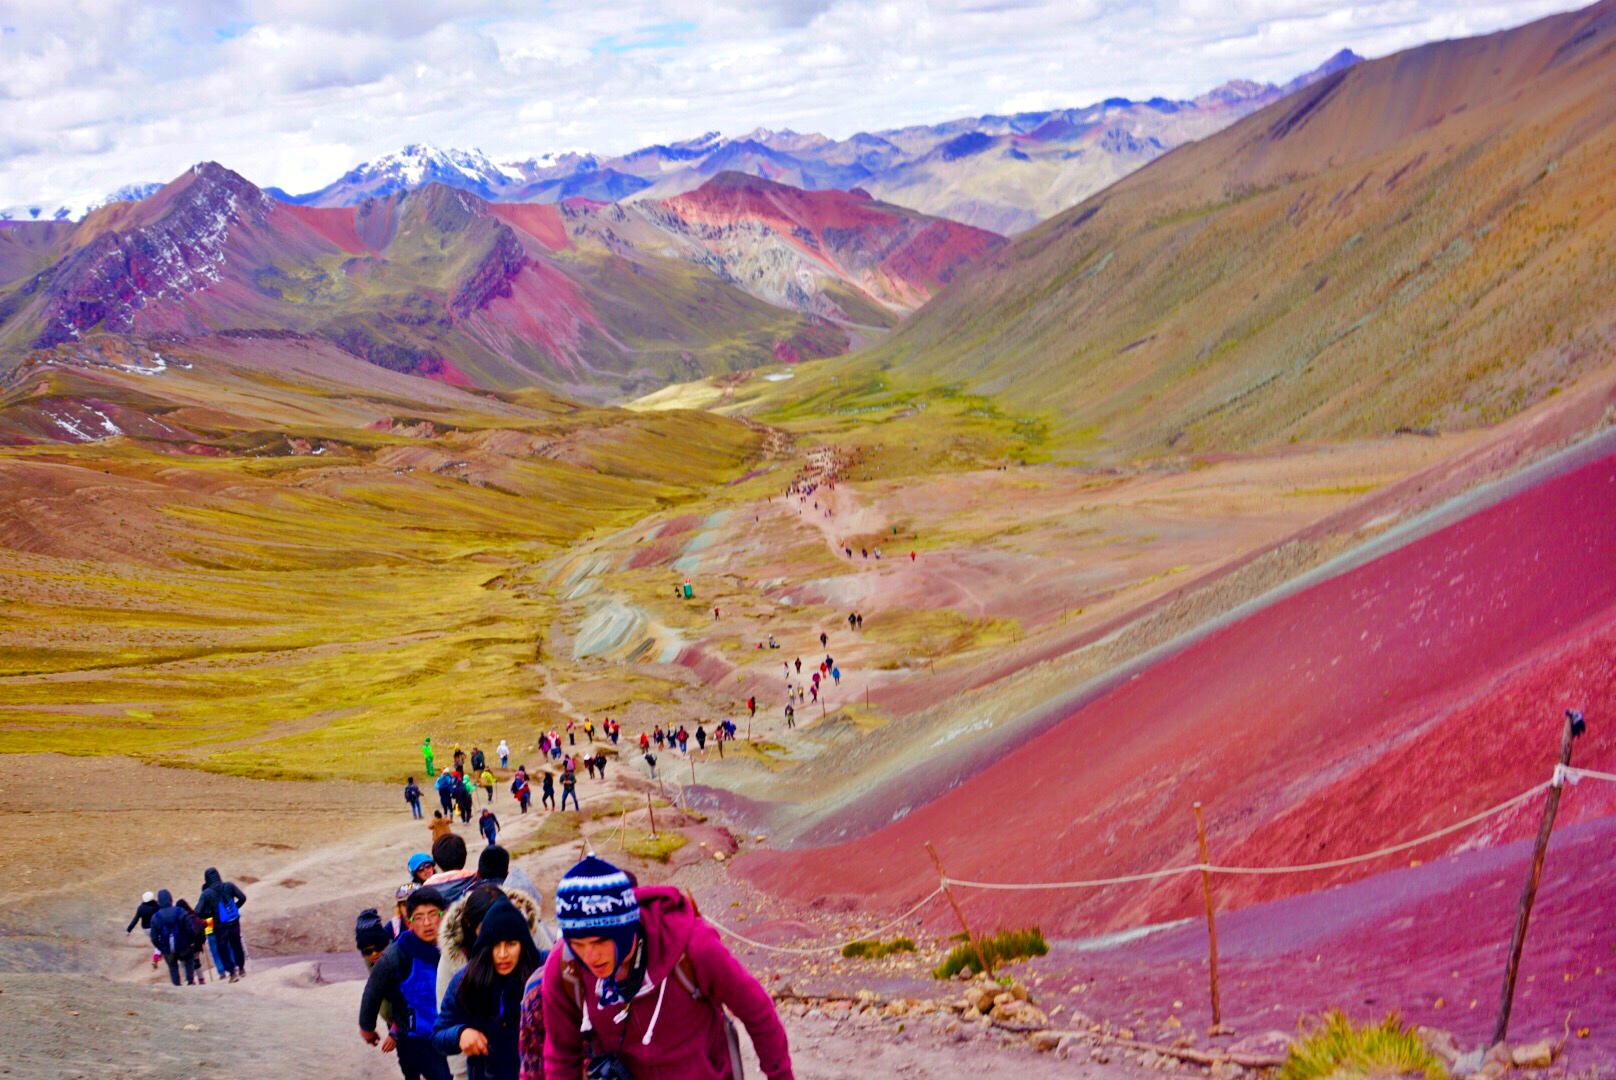 The torturous climb to Rainbow Mountain, Peru.